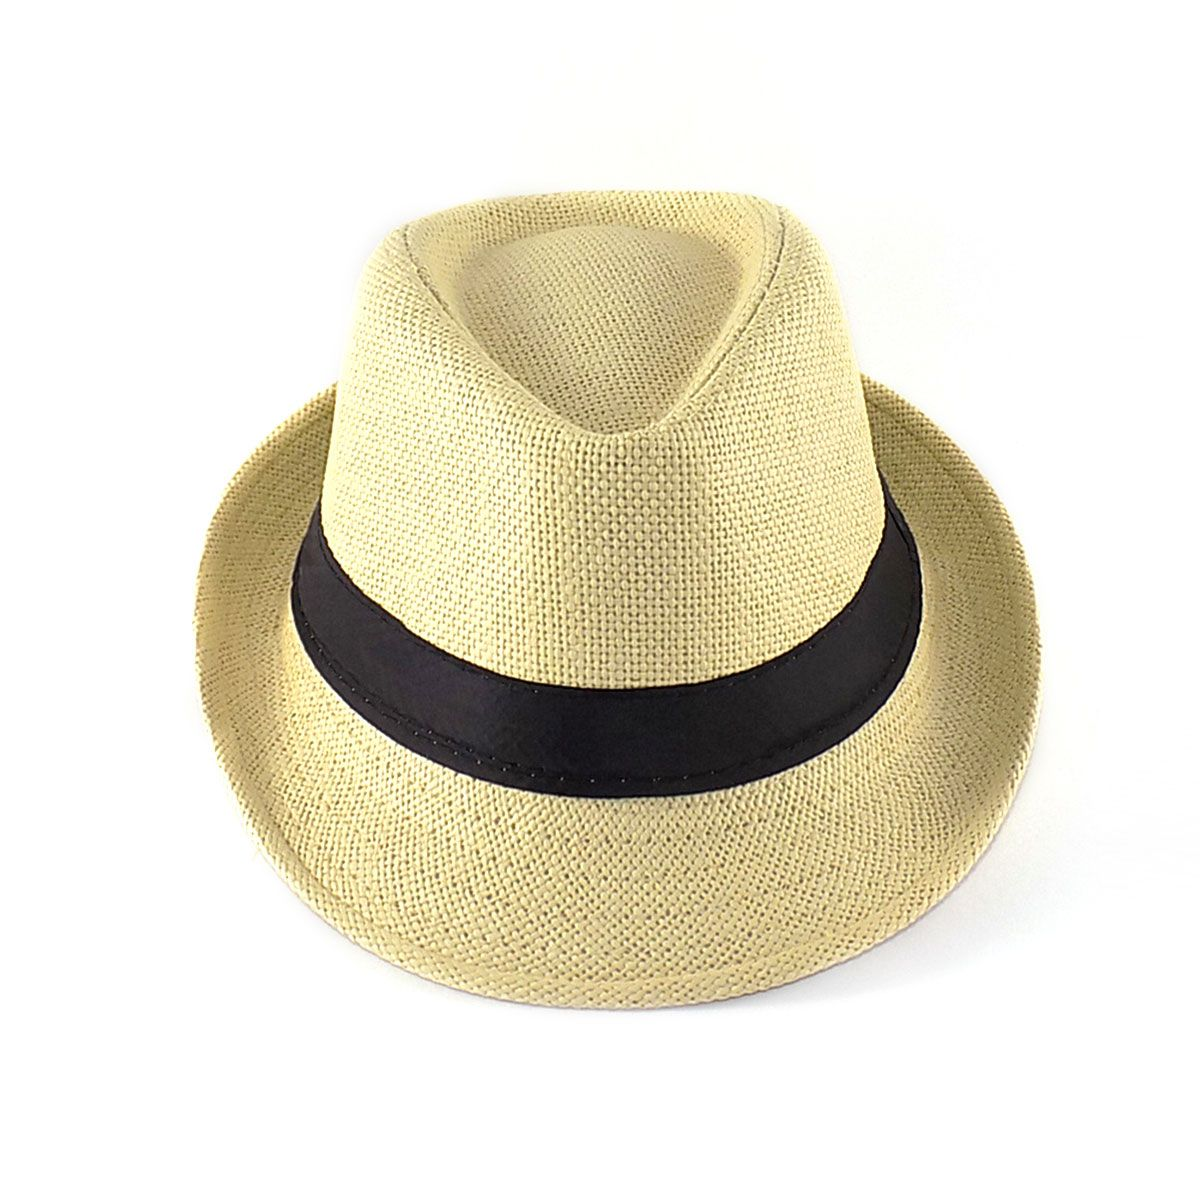 Chapéu Fedora aba curta - Palhinha - Bege